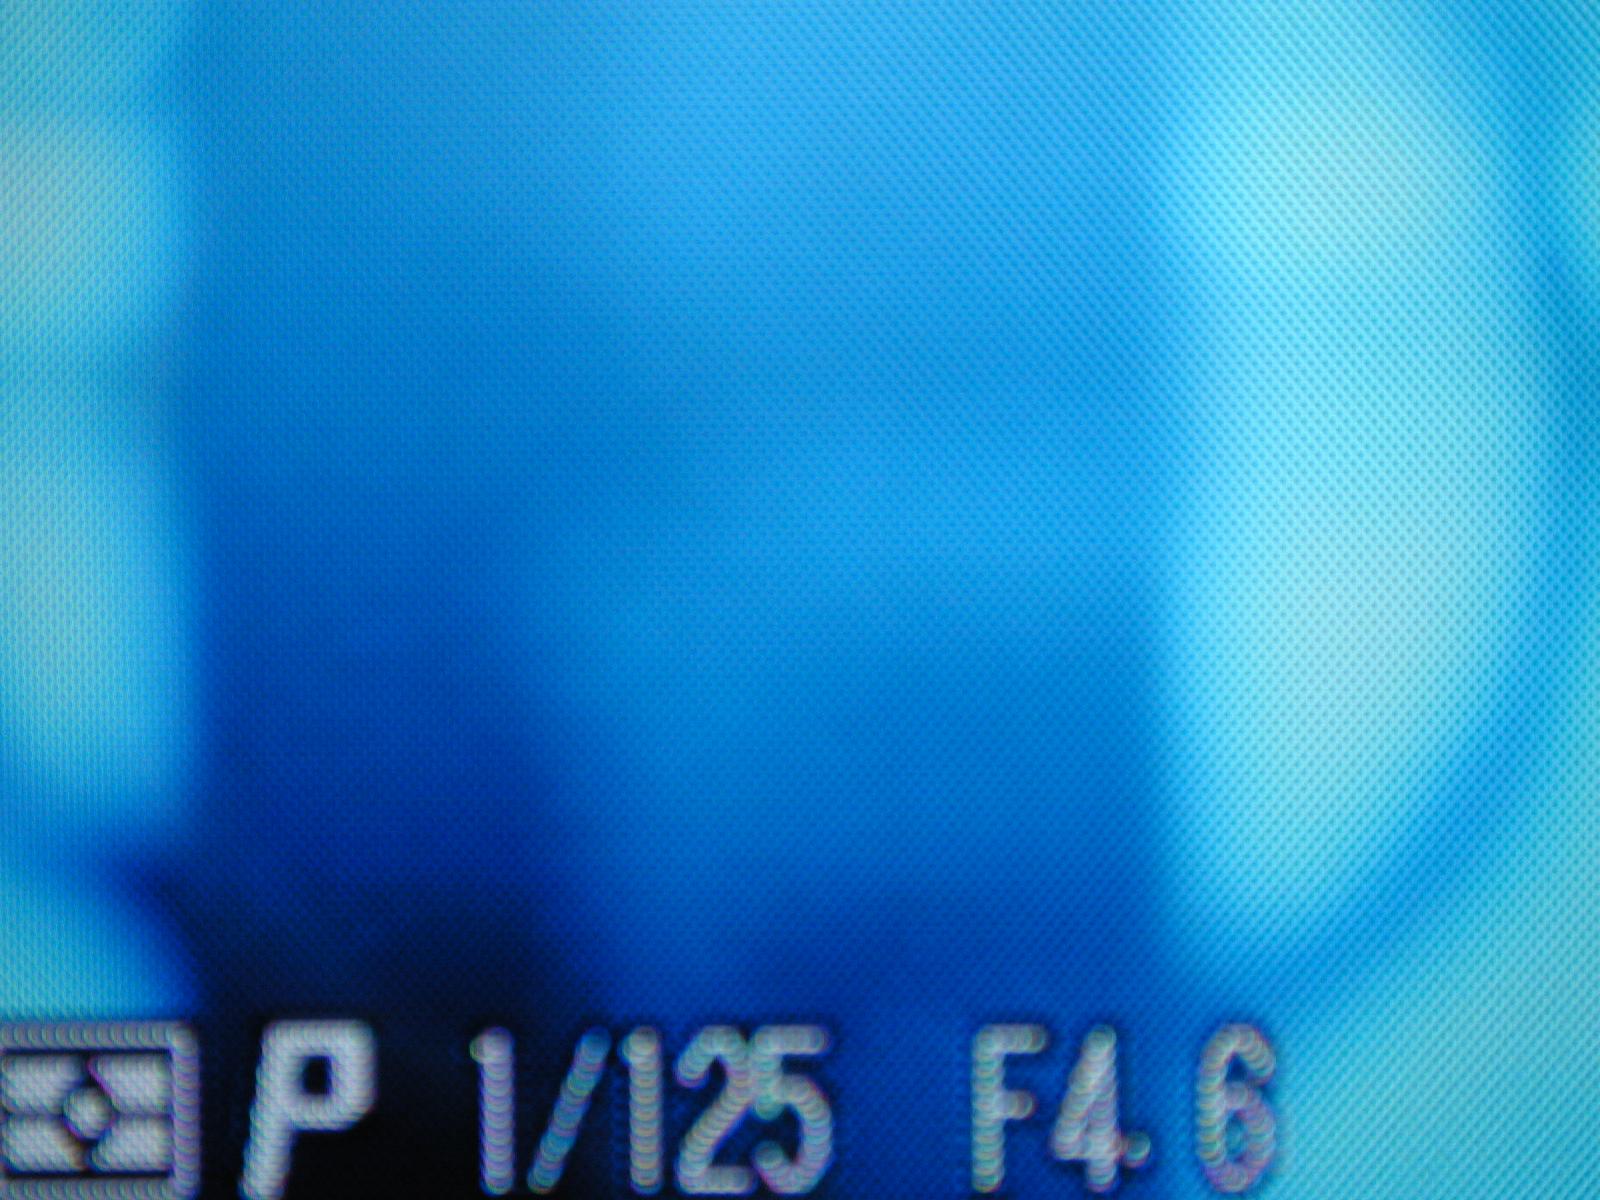 nikon lcd screen camera blue